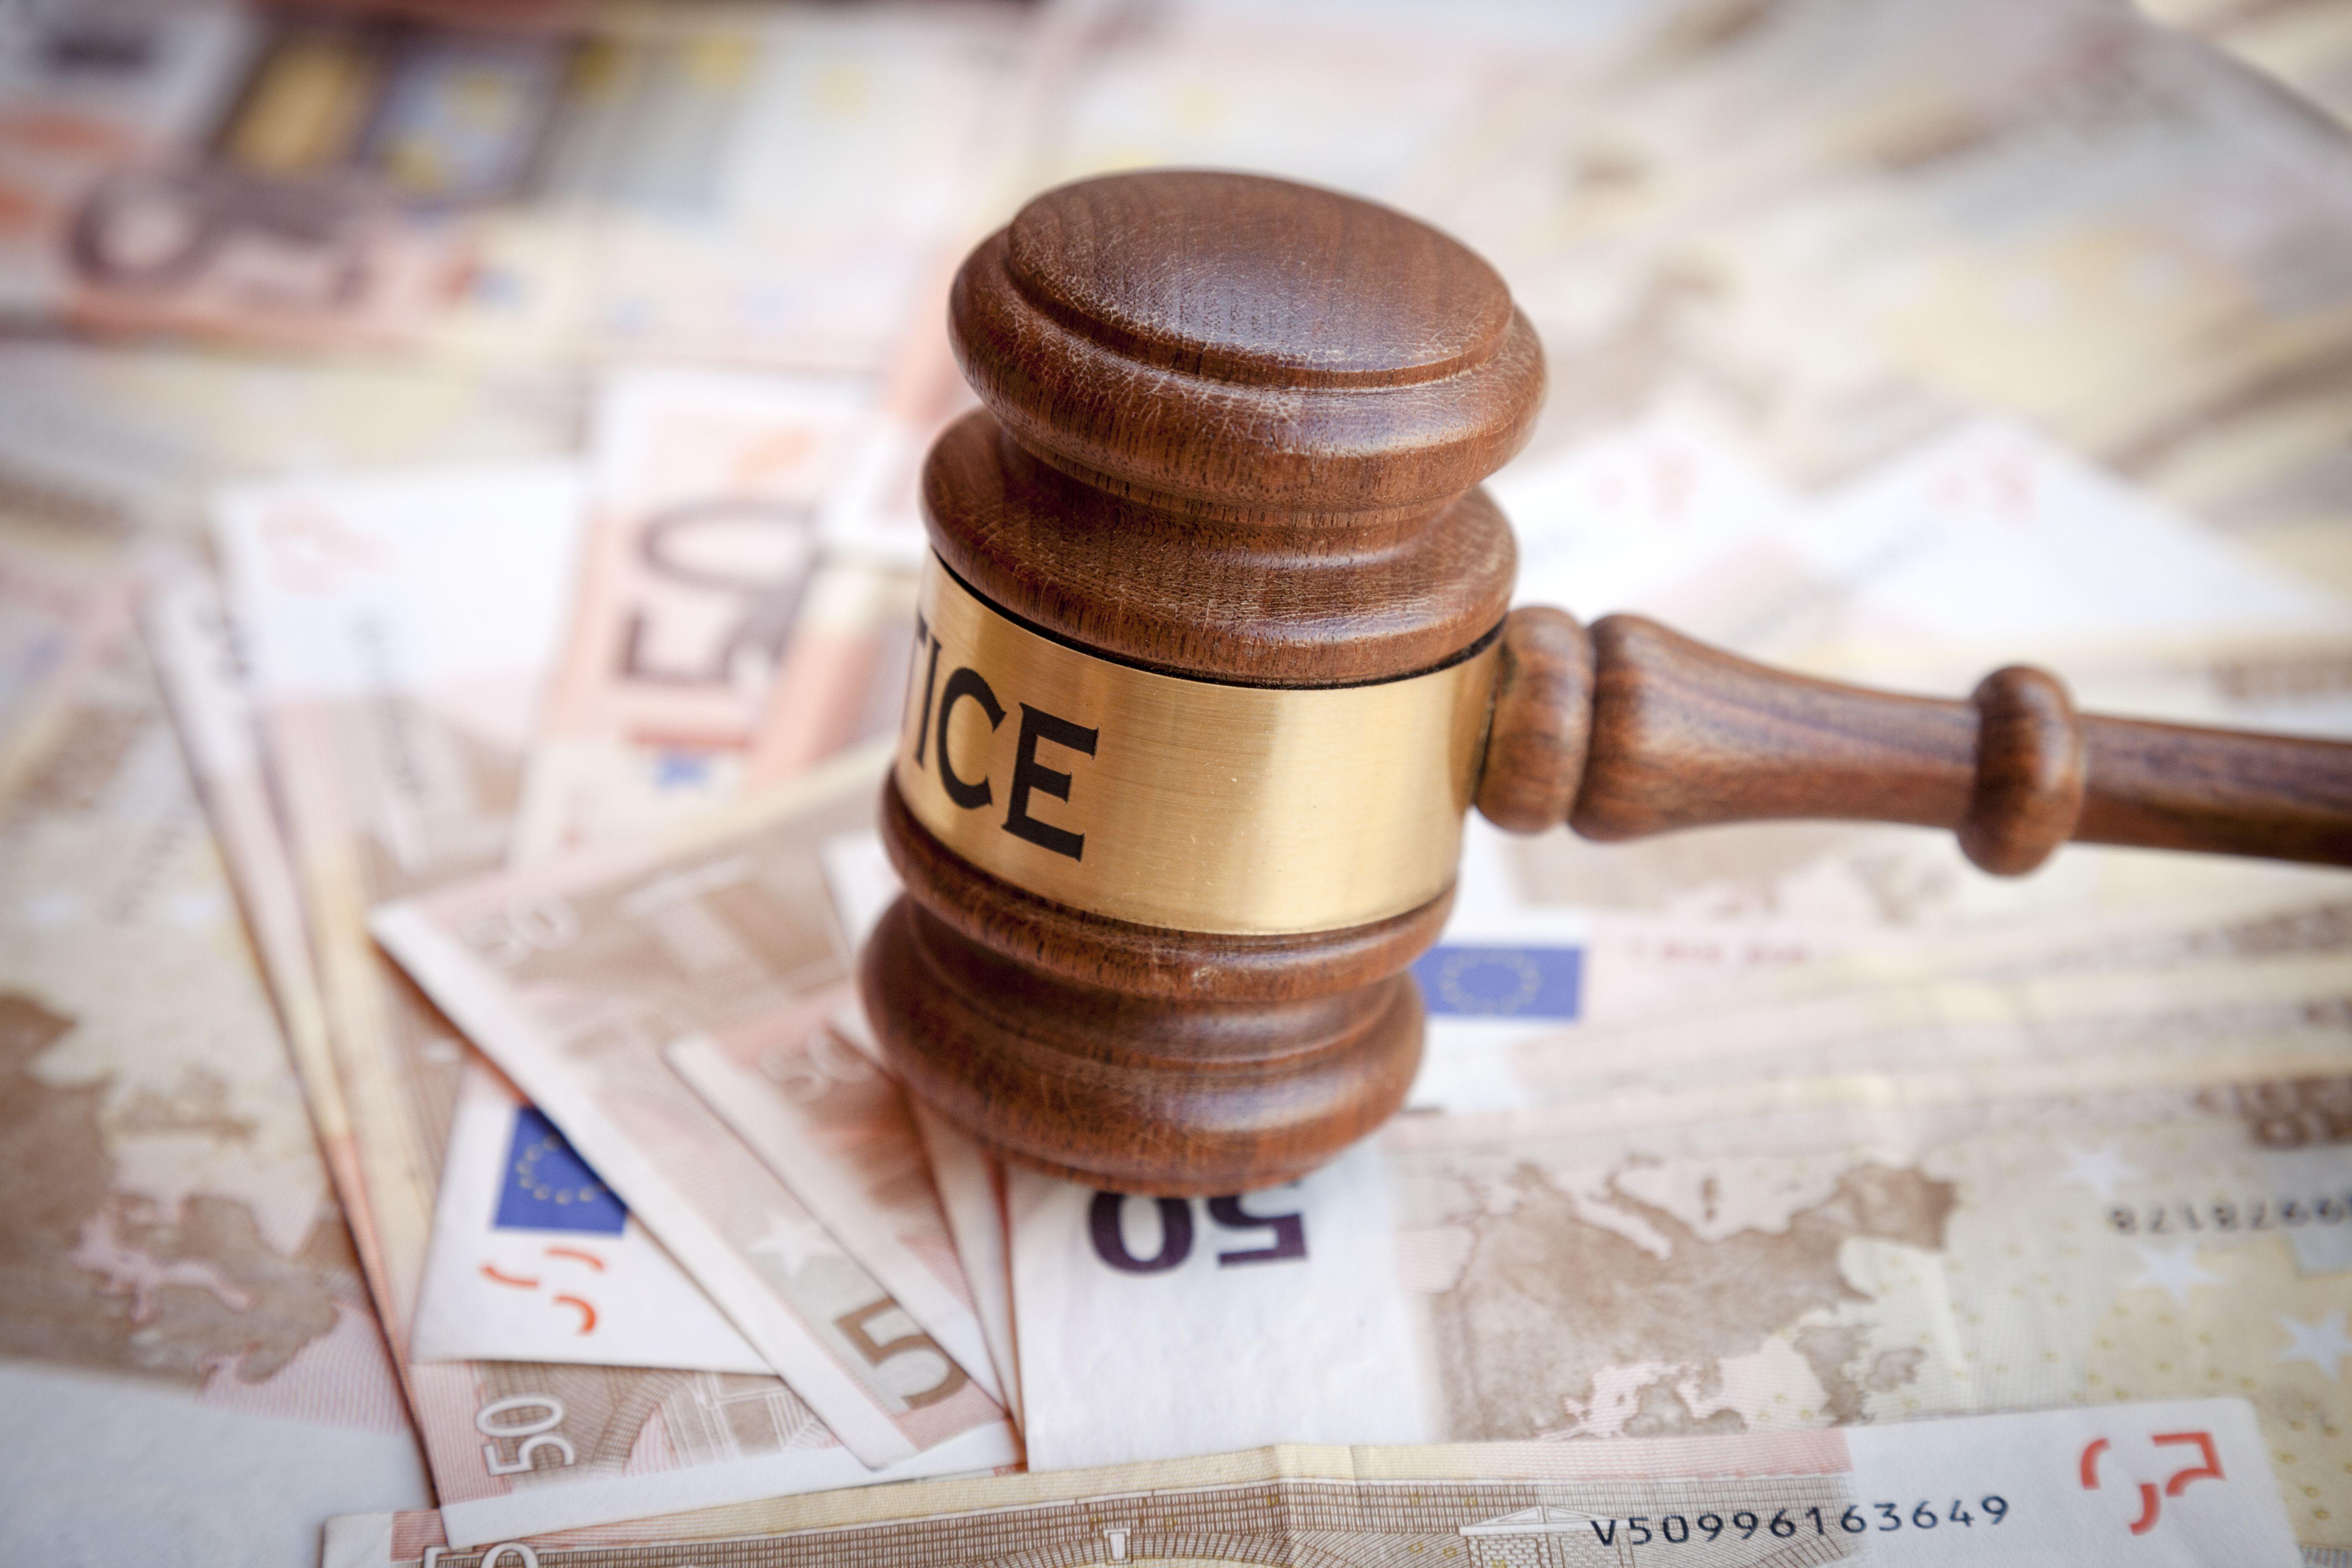 Herencias: Servicios de Asesoría Jurídica Aza